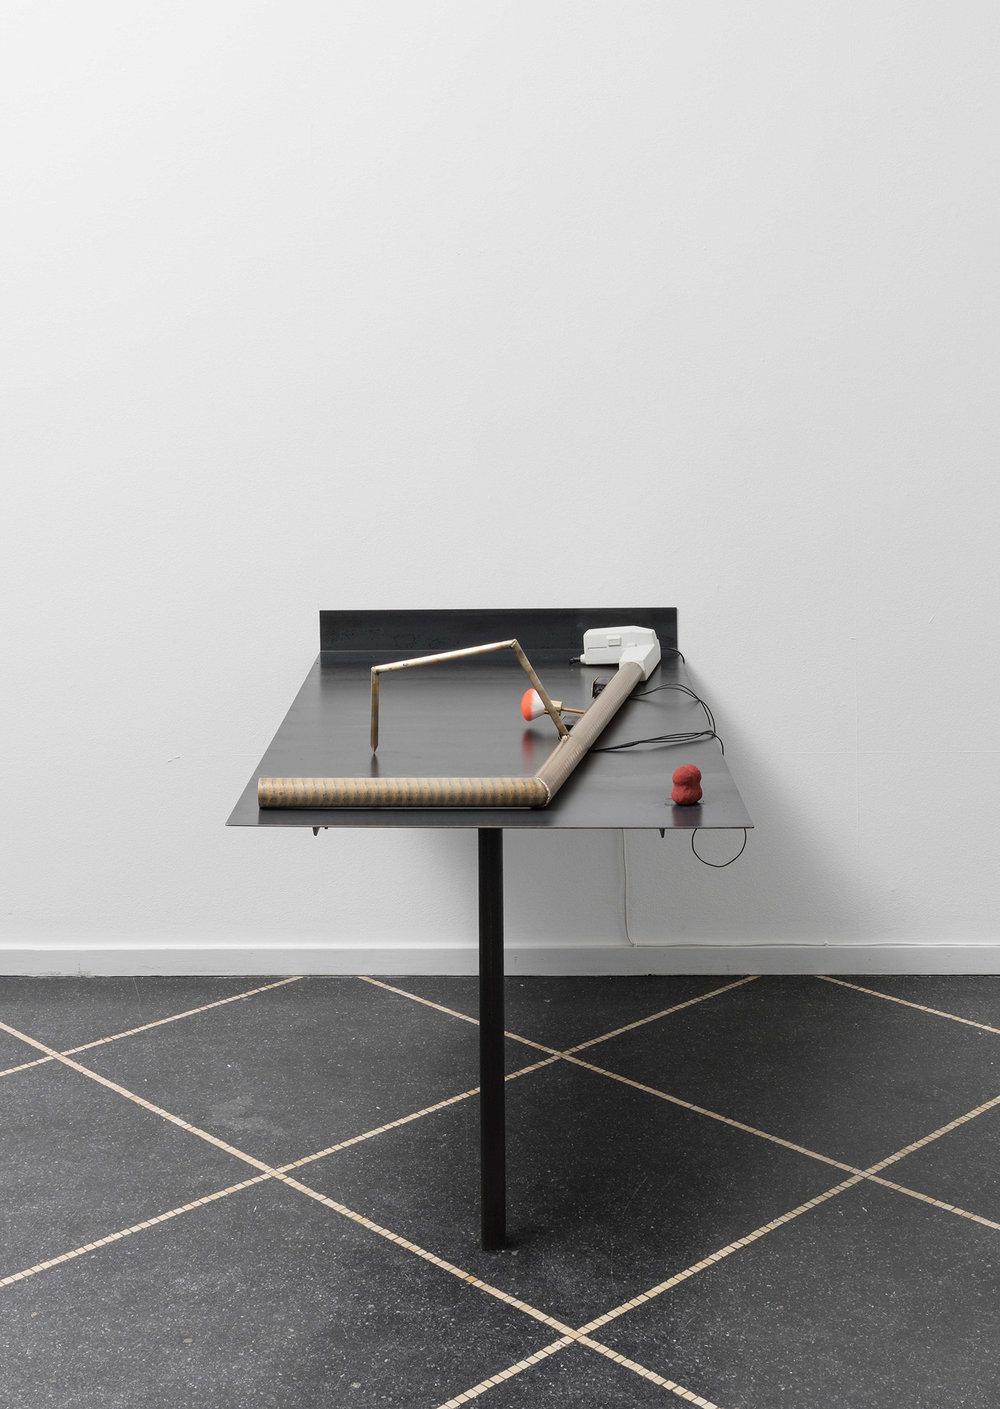 COH, The Cuddler, 2017 (Bronze, kropsbørste, spindelmotor). Double FaceBlender, 2017 (bronze, pigment). Foto:Anders Sune Berg © Galleri Susanne Ottesen.